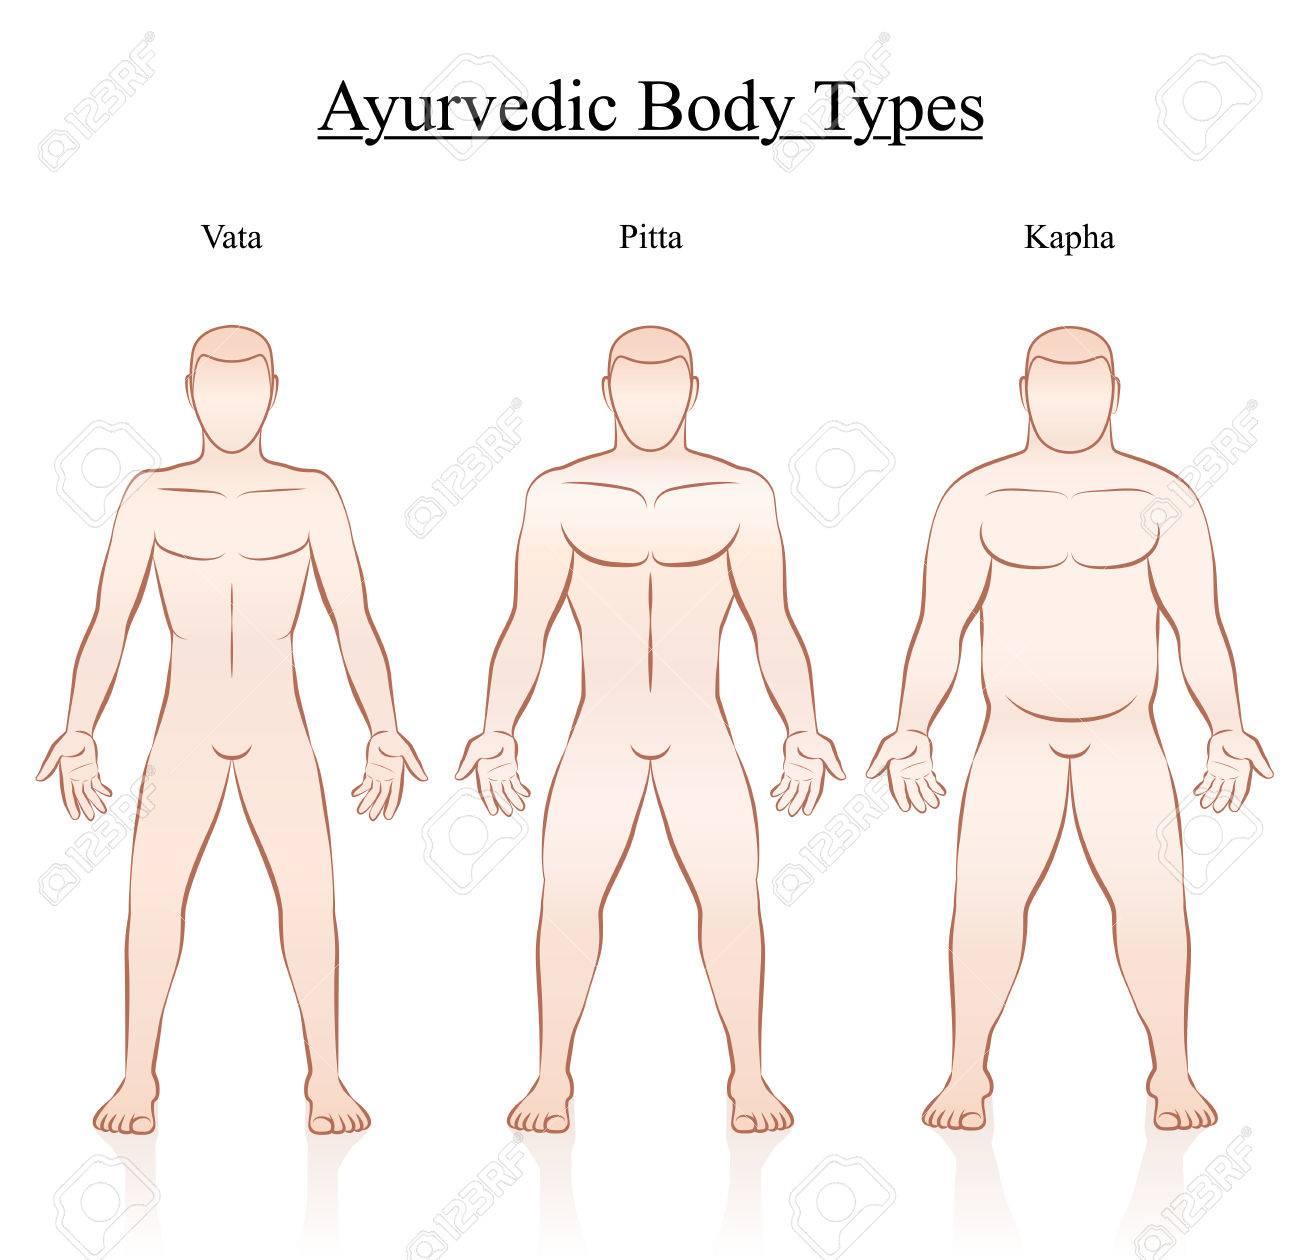 Ayurvedic Body Constitution Types Vata Pitta Kapha Outline